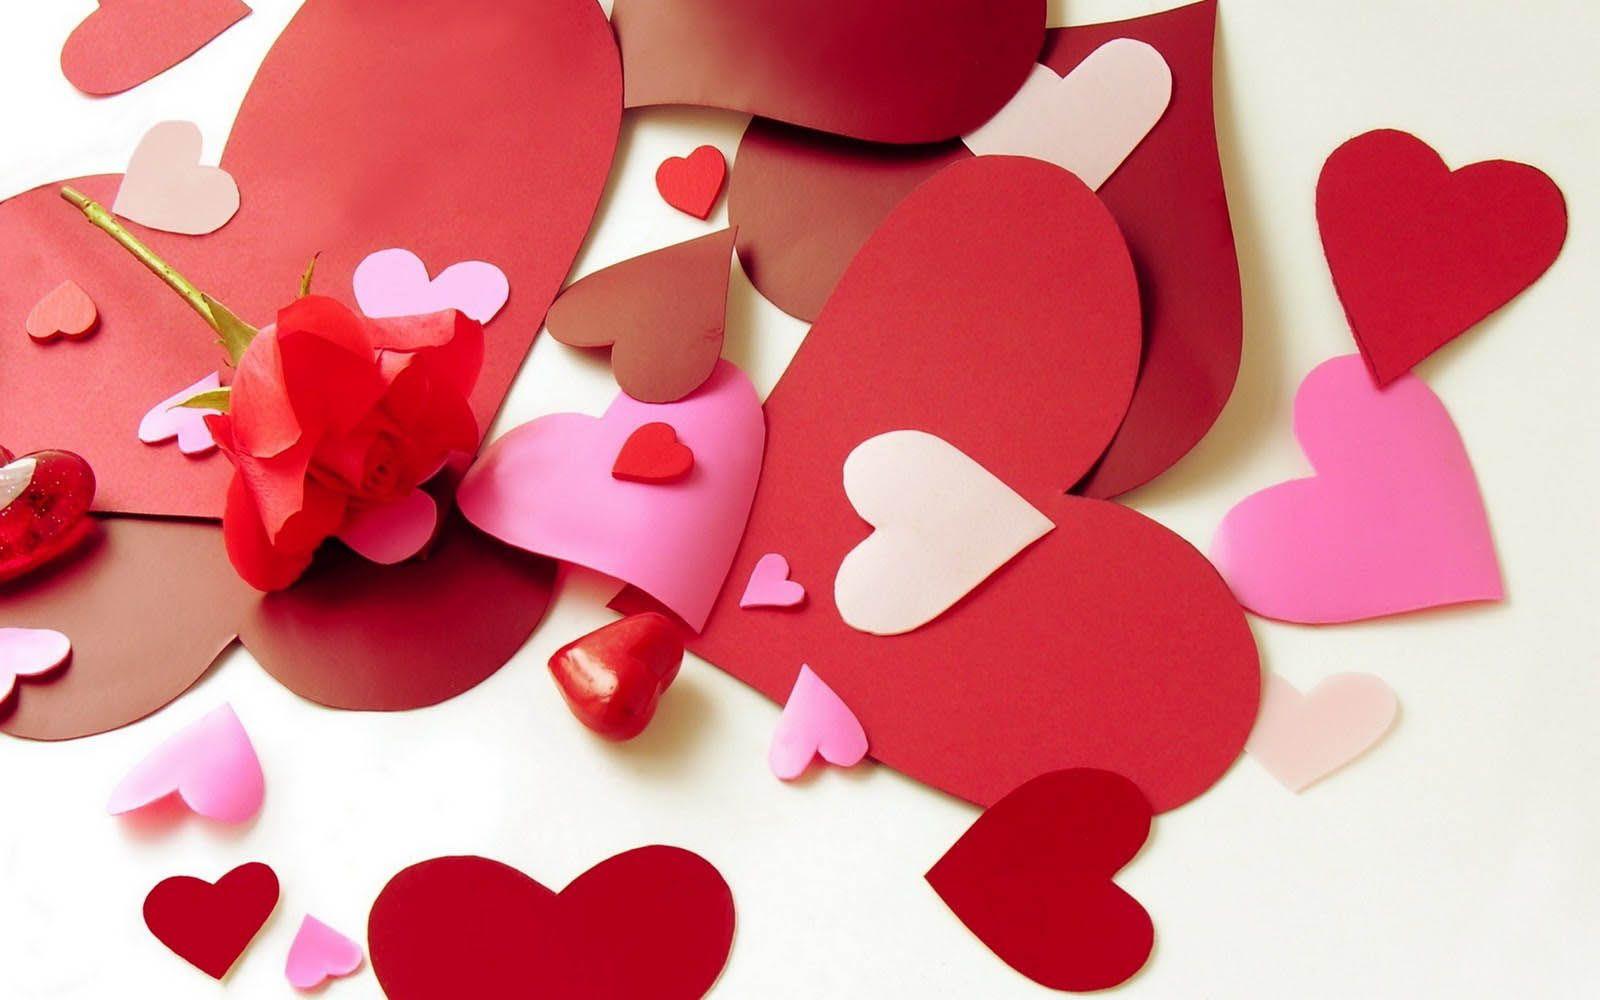 free love wallpaper desktop #h811374   love hd wallpaper